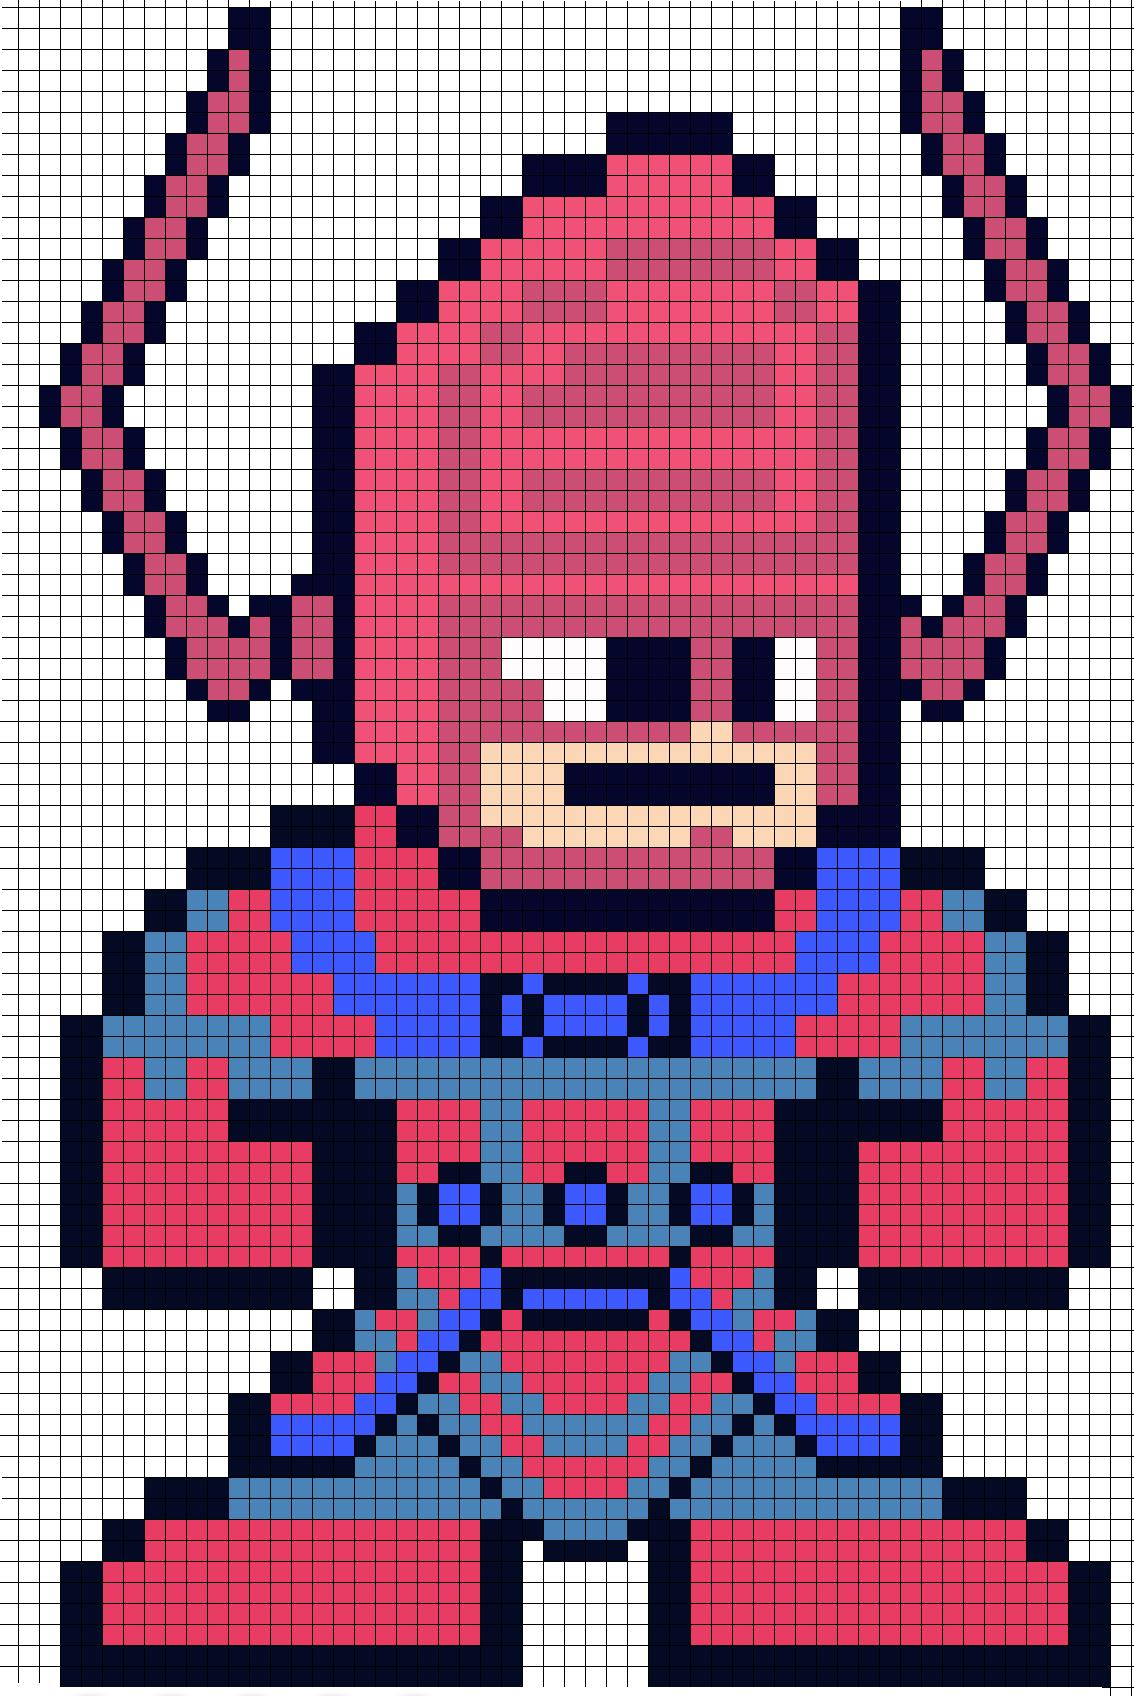 Galactus Perler Bead Pattern Marvel 8 Bit Perler Bead Patterns